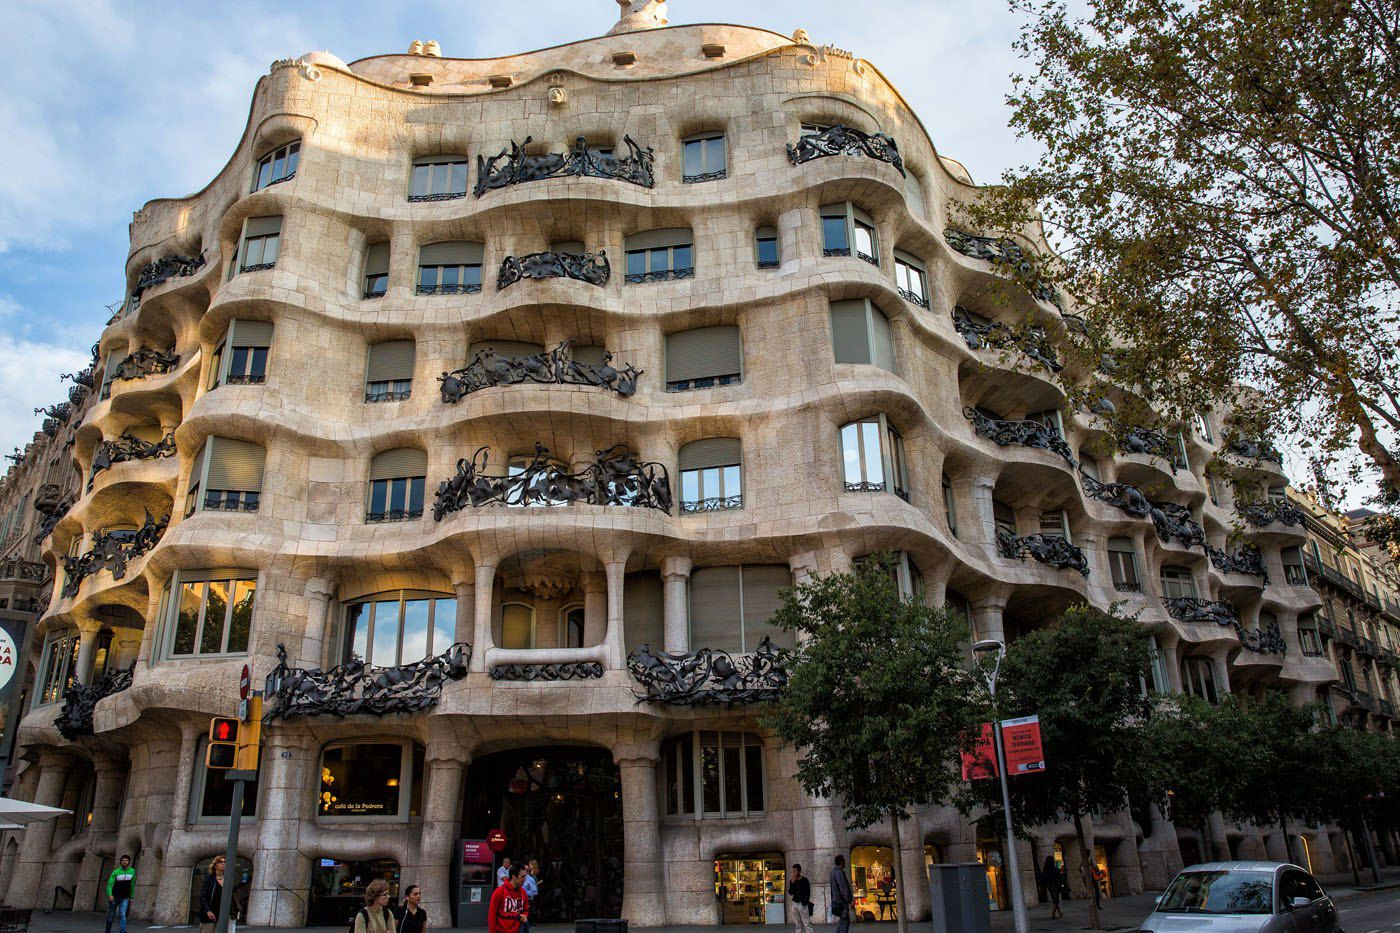 Красивая архитектура Барселоны, Испания